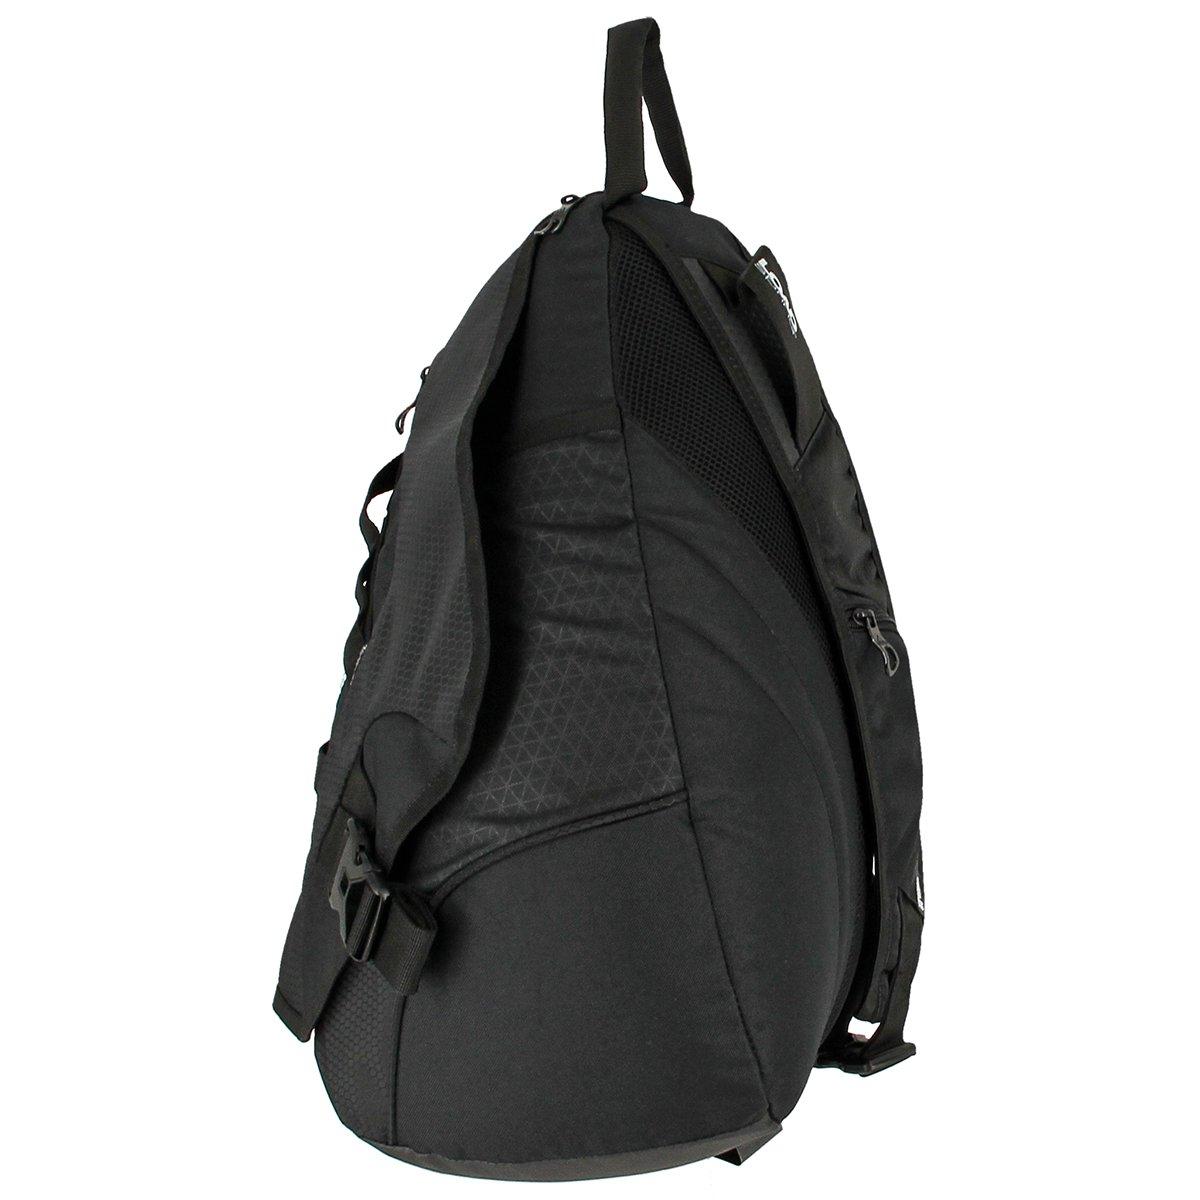 Sling bag tokopedia - Sling Bag Tokopedia 21